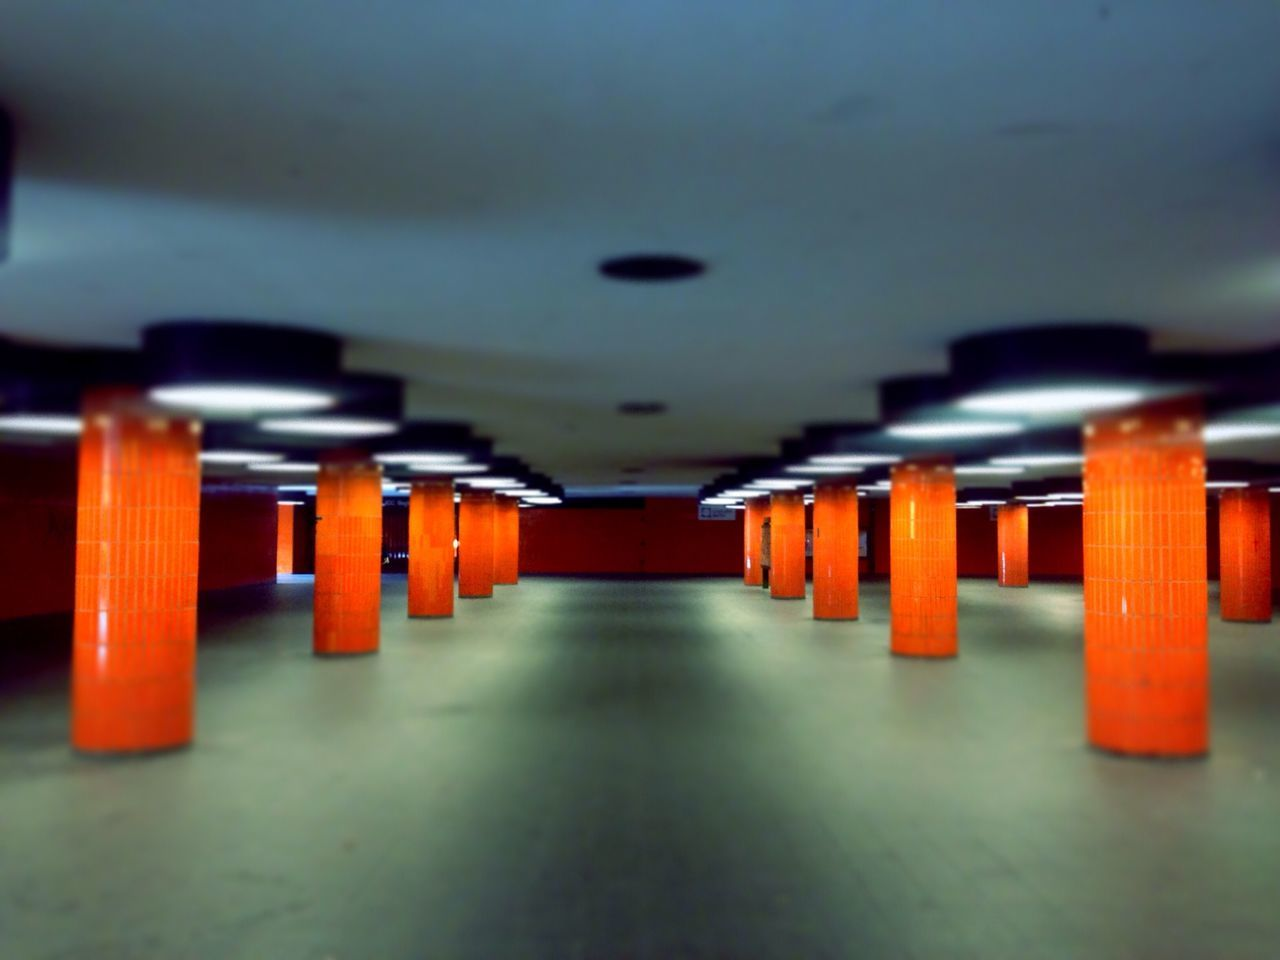 I ❤ BERLIN Symmetrical The World Needs More Orange Supernormal Geometric Shapes